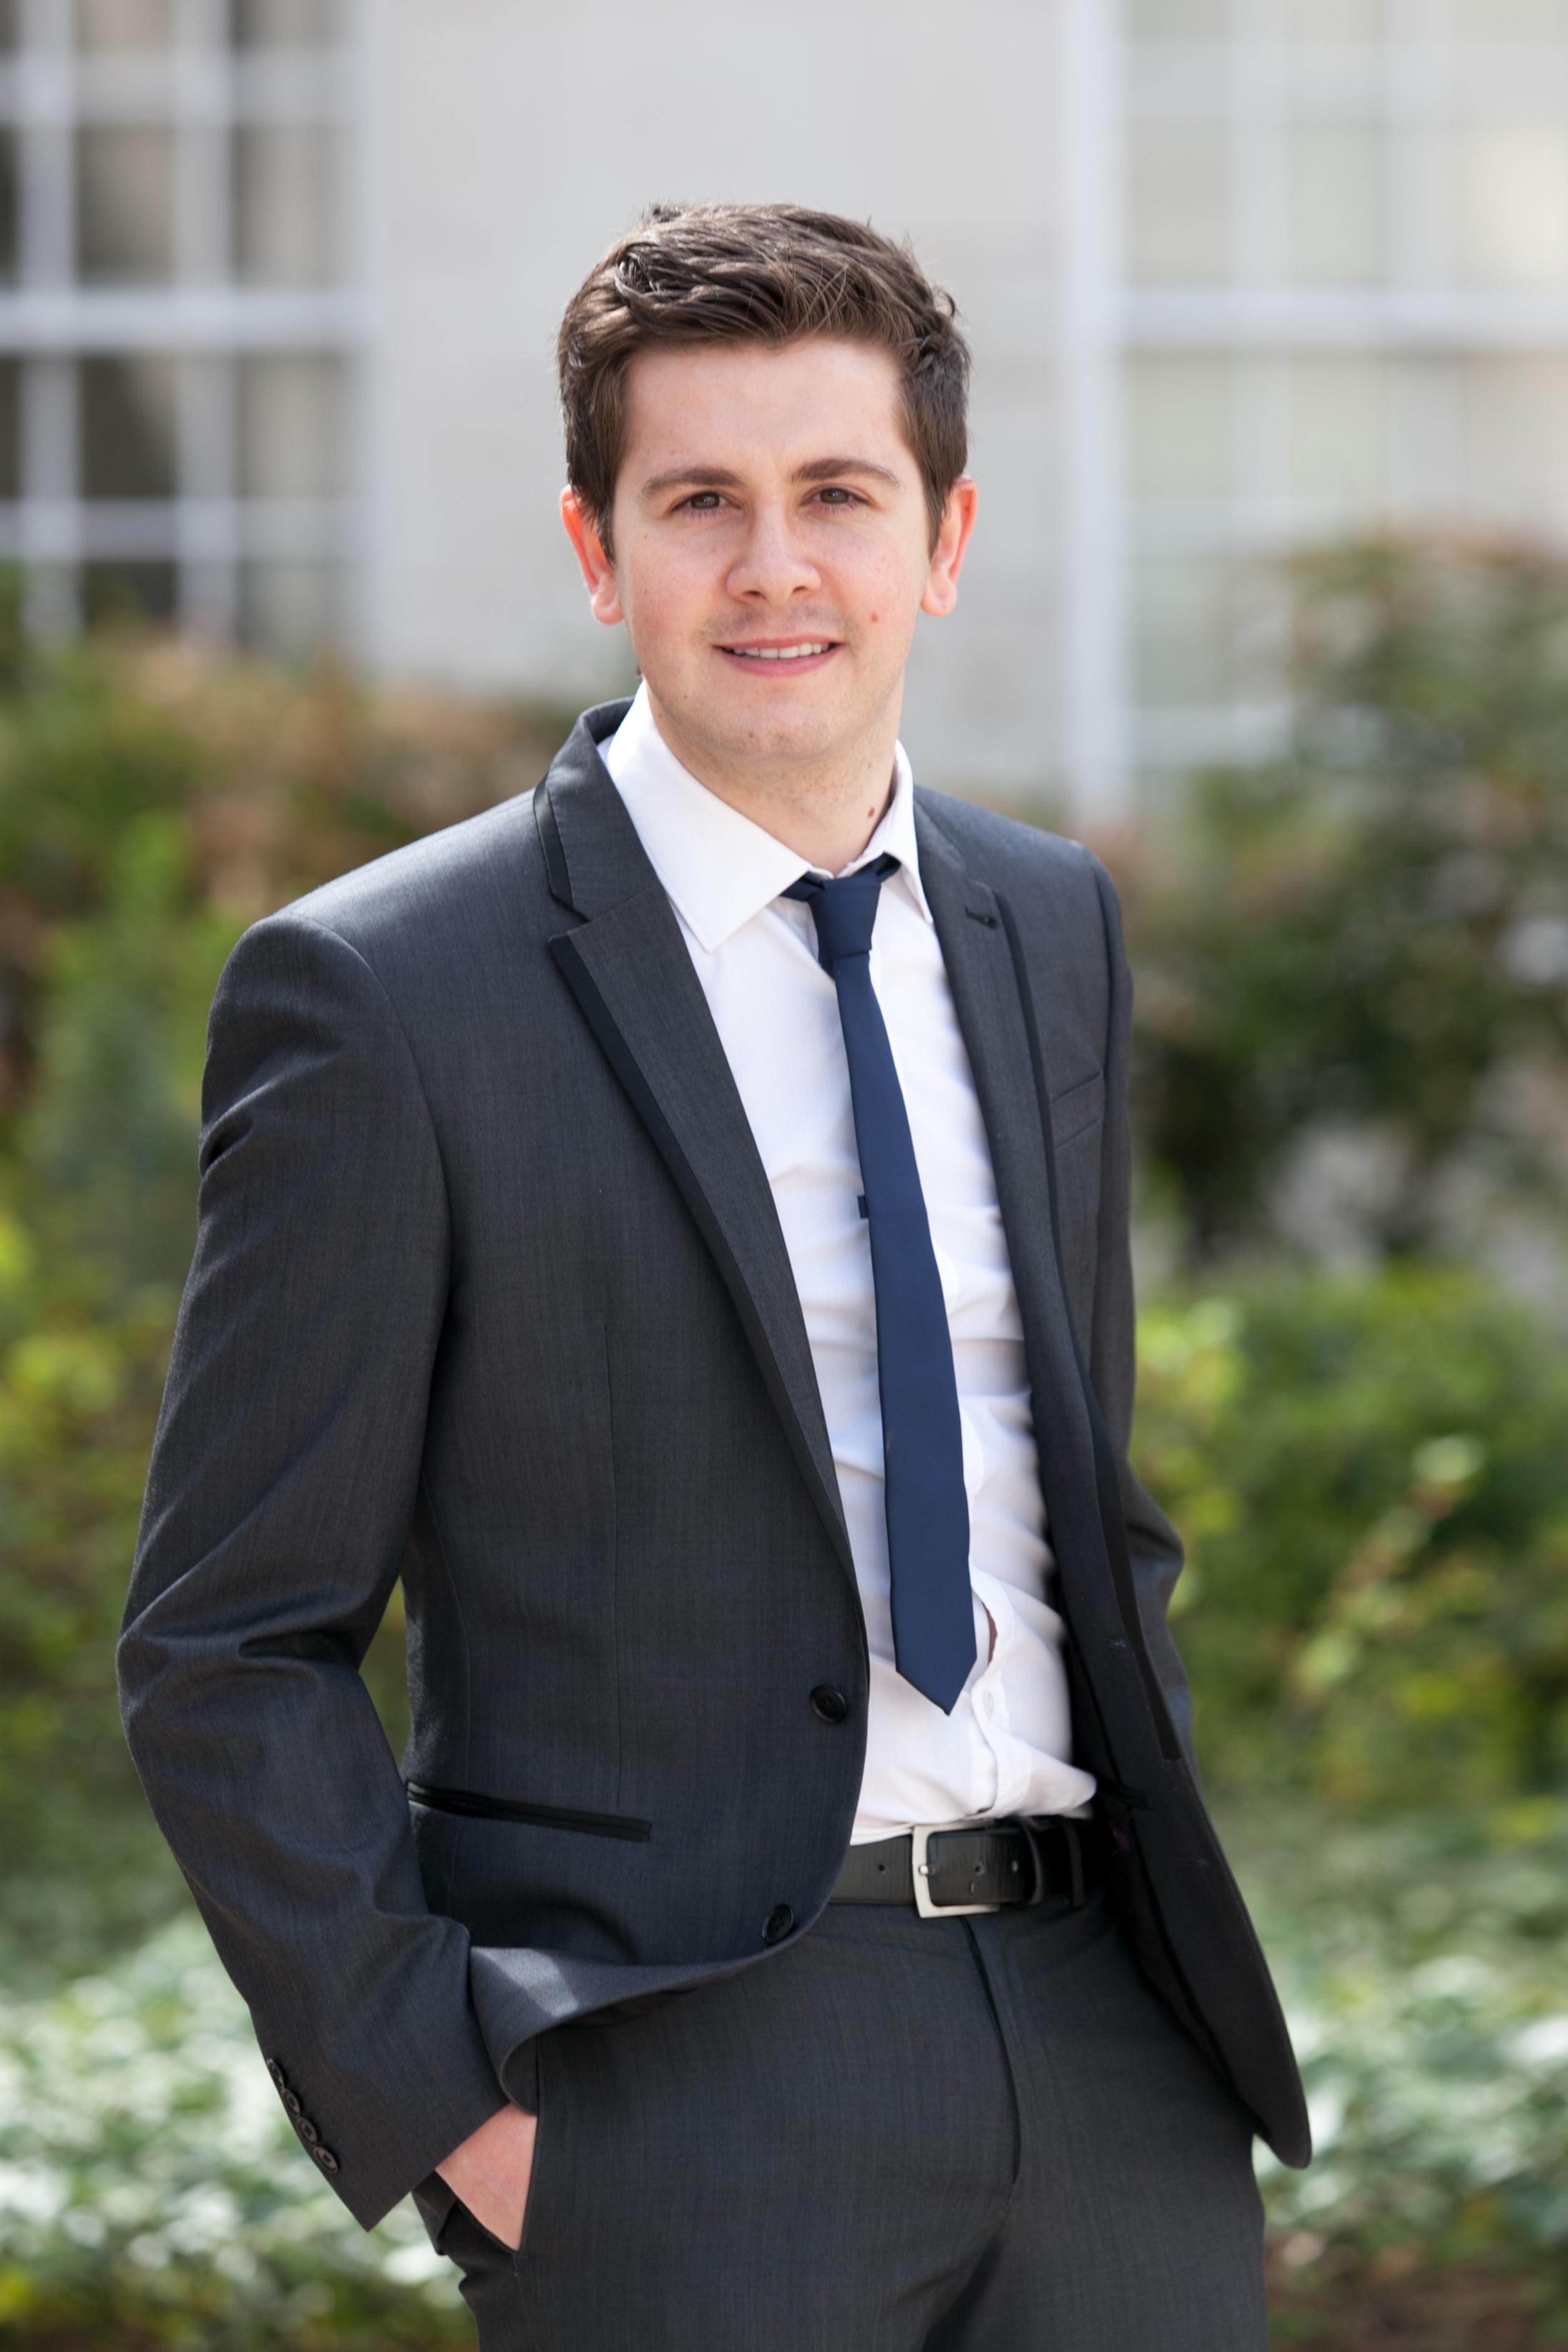 Mathew Liasis Wins Barclays Leadership Prize Nottingham